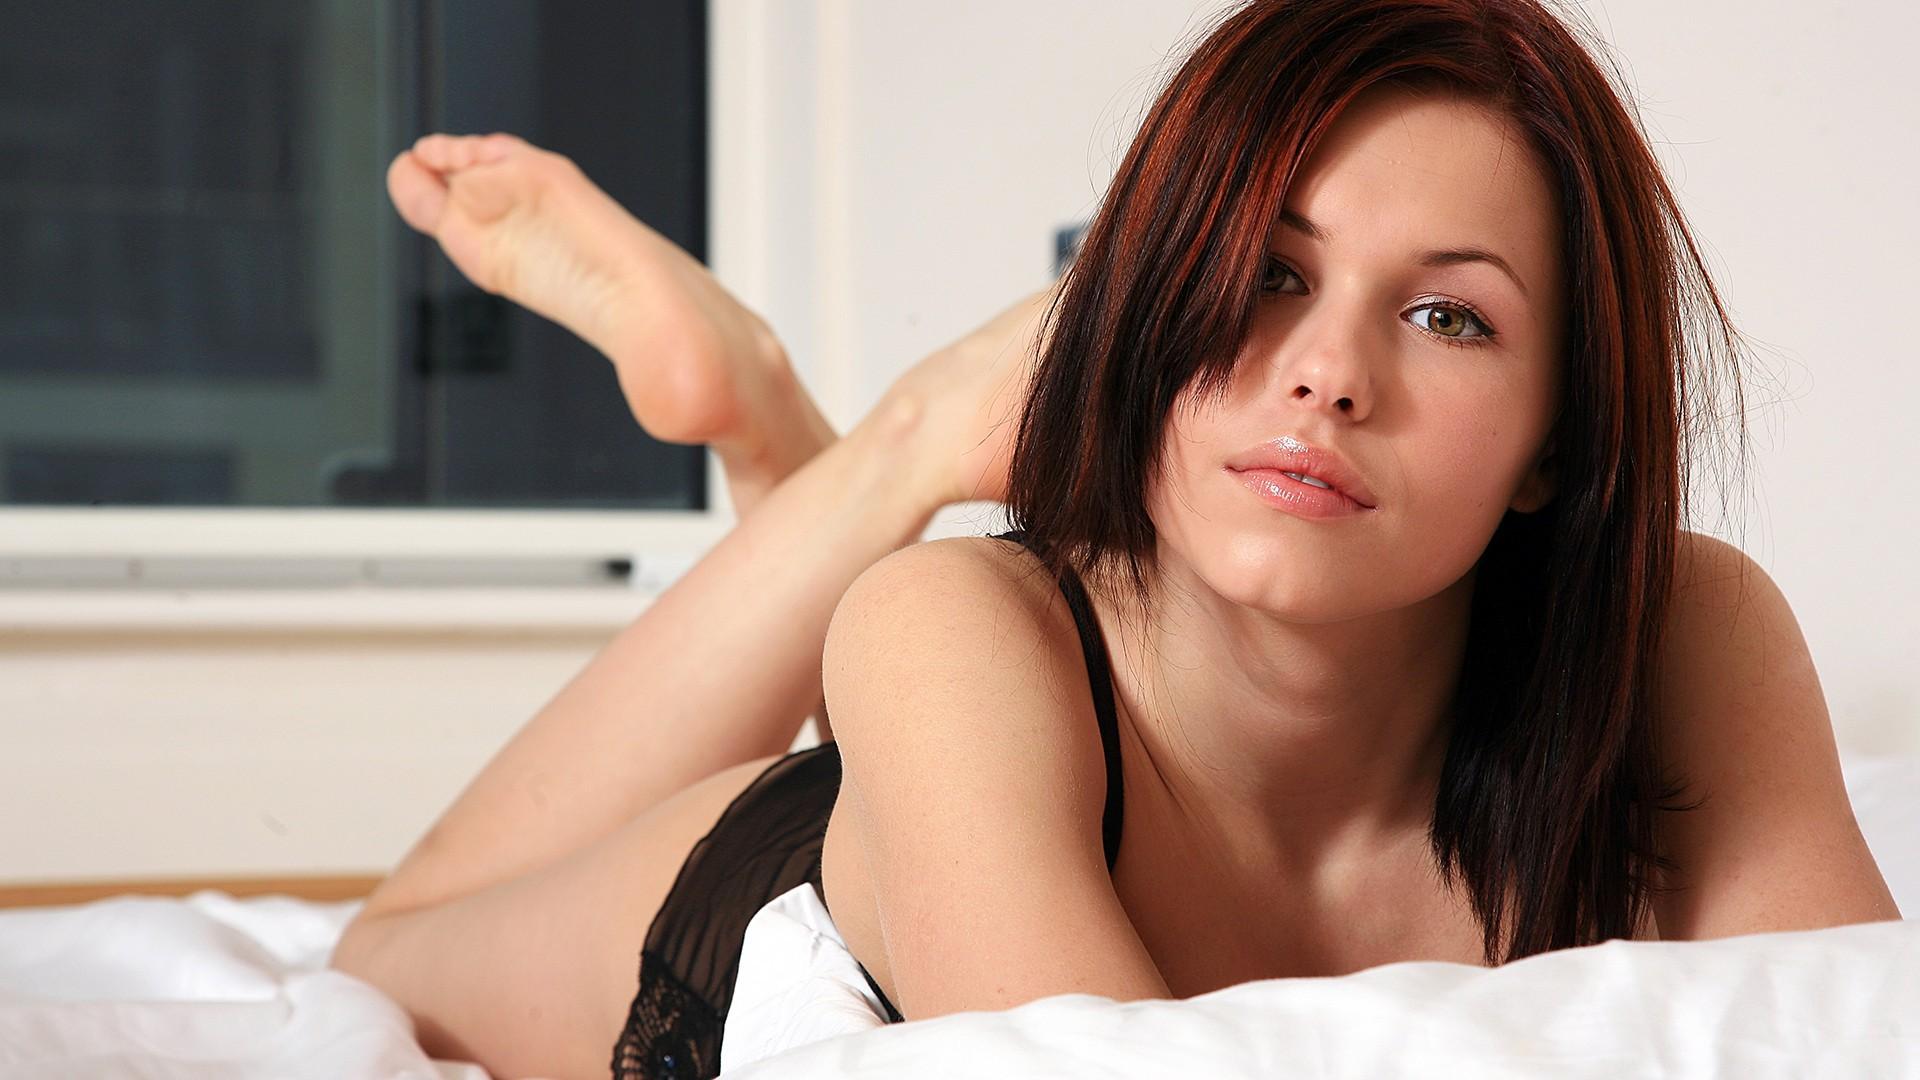 Huge cgi women nude